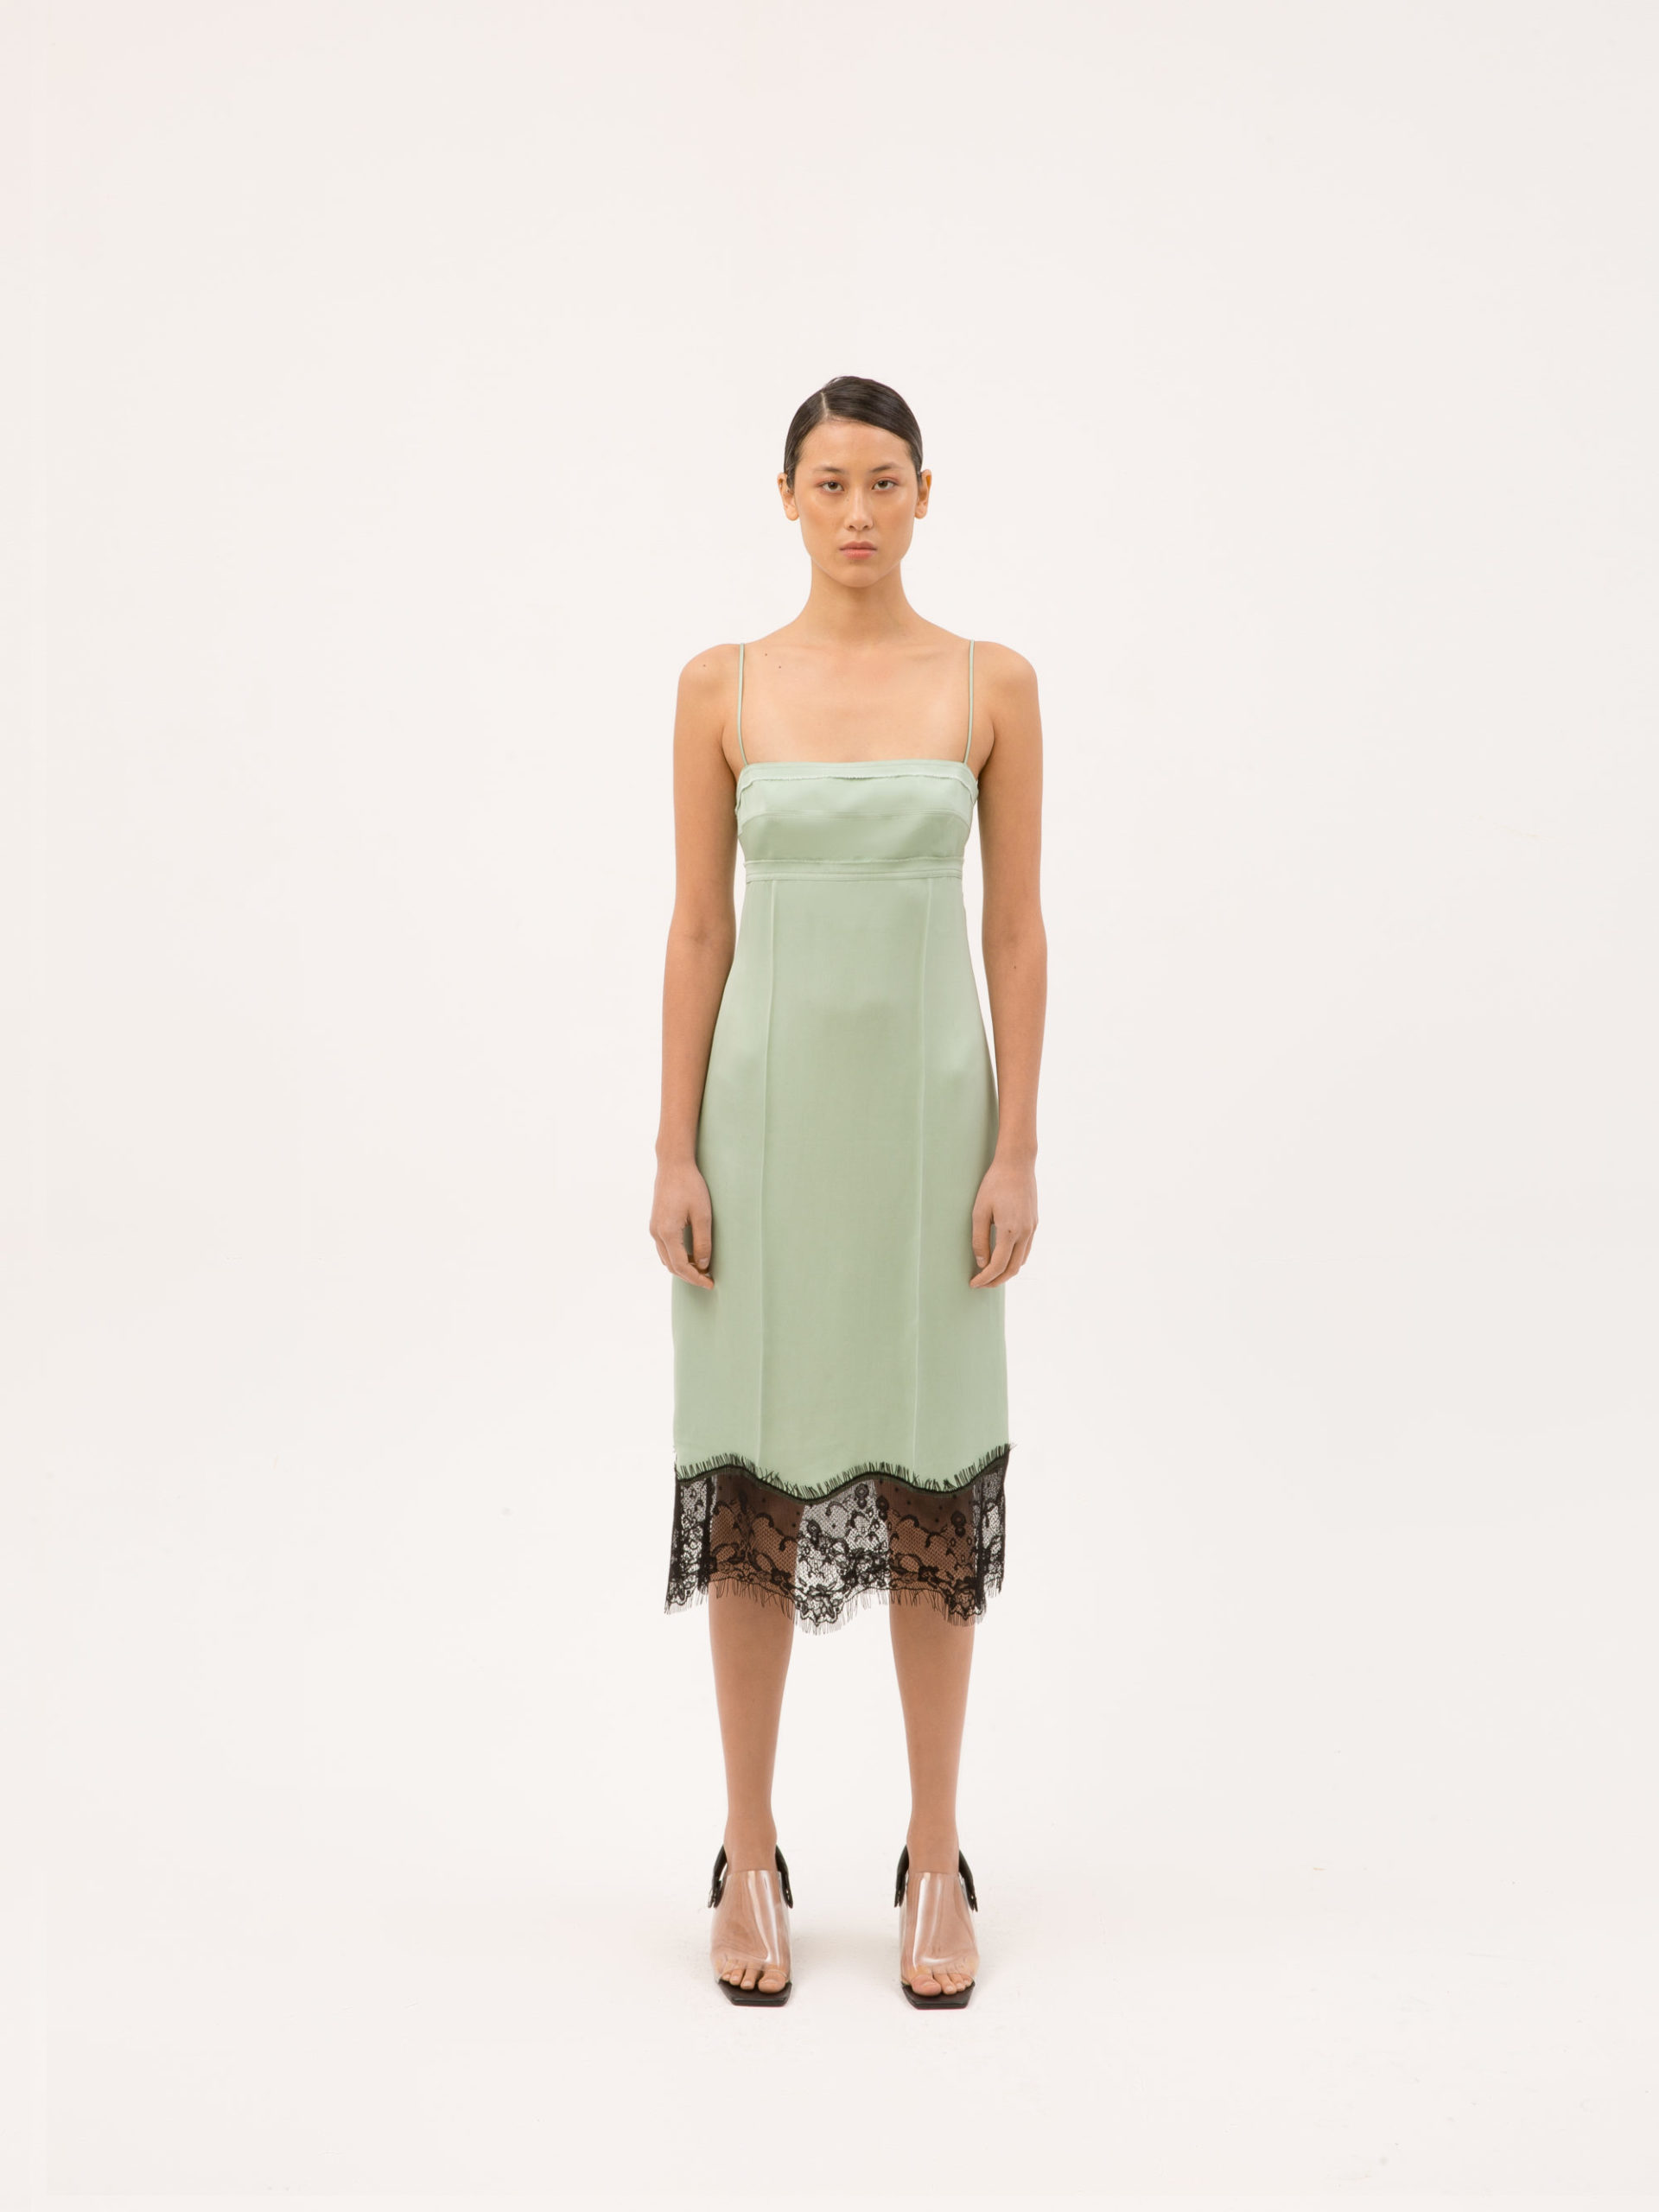 Ментоловый образ от Tamuna Ingorokva Ready To Wear весна-лето 2021